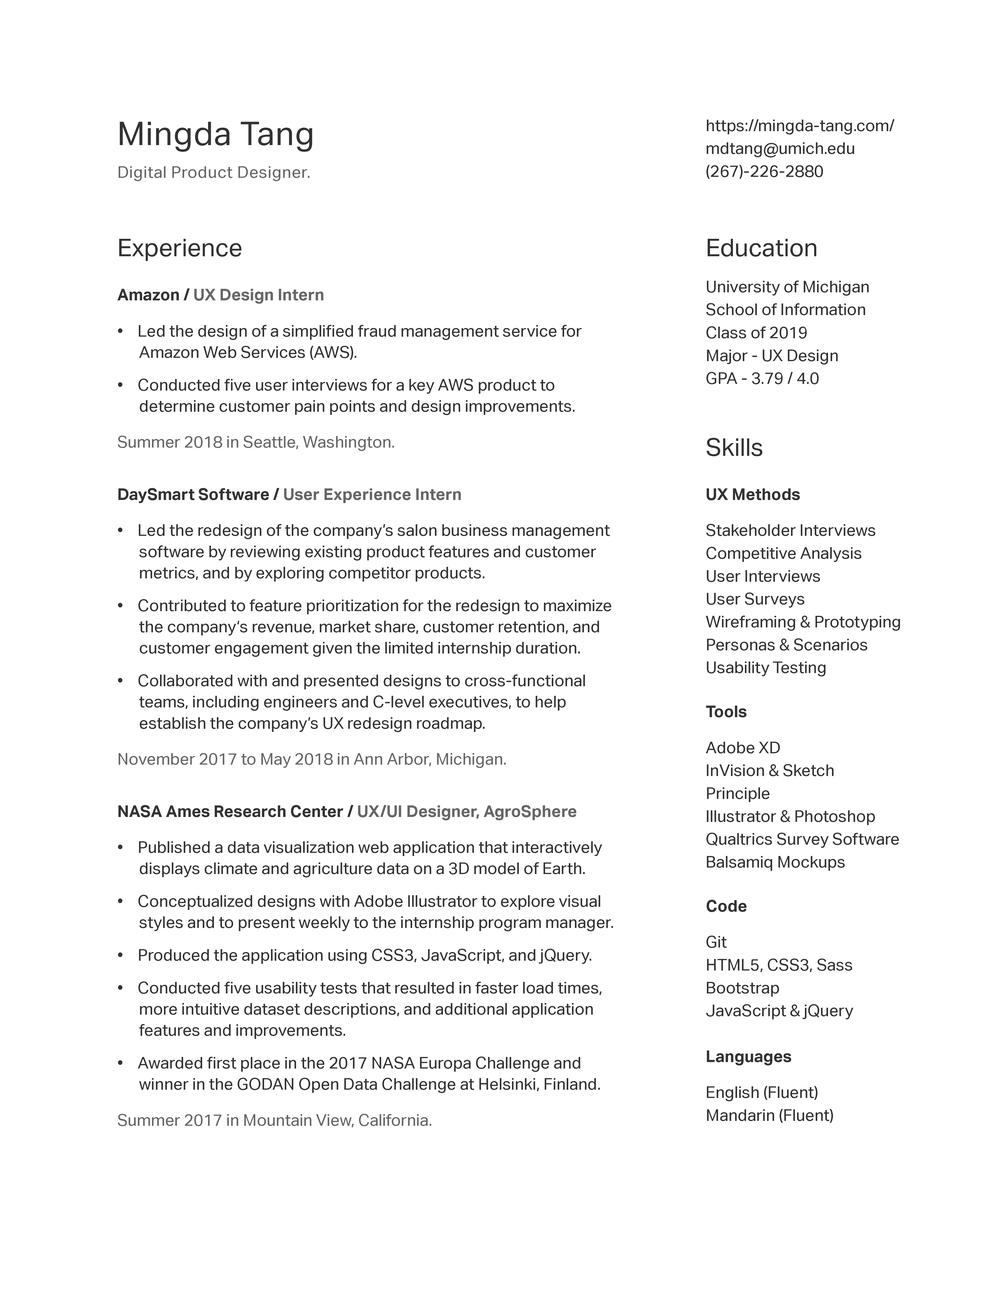 Mingda Tang Resume.png